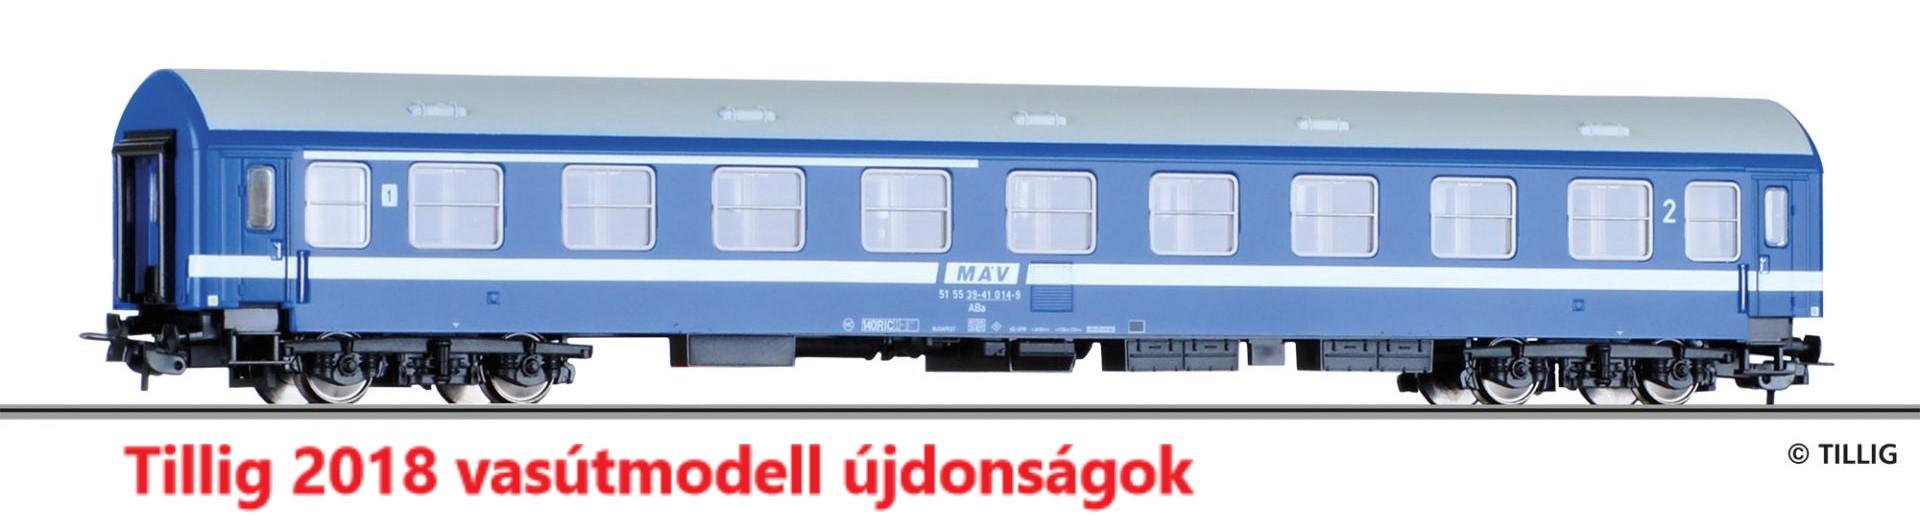 Tillig 2018 vasútmodell újdonságok